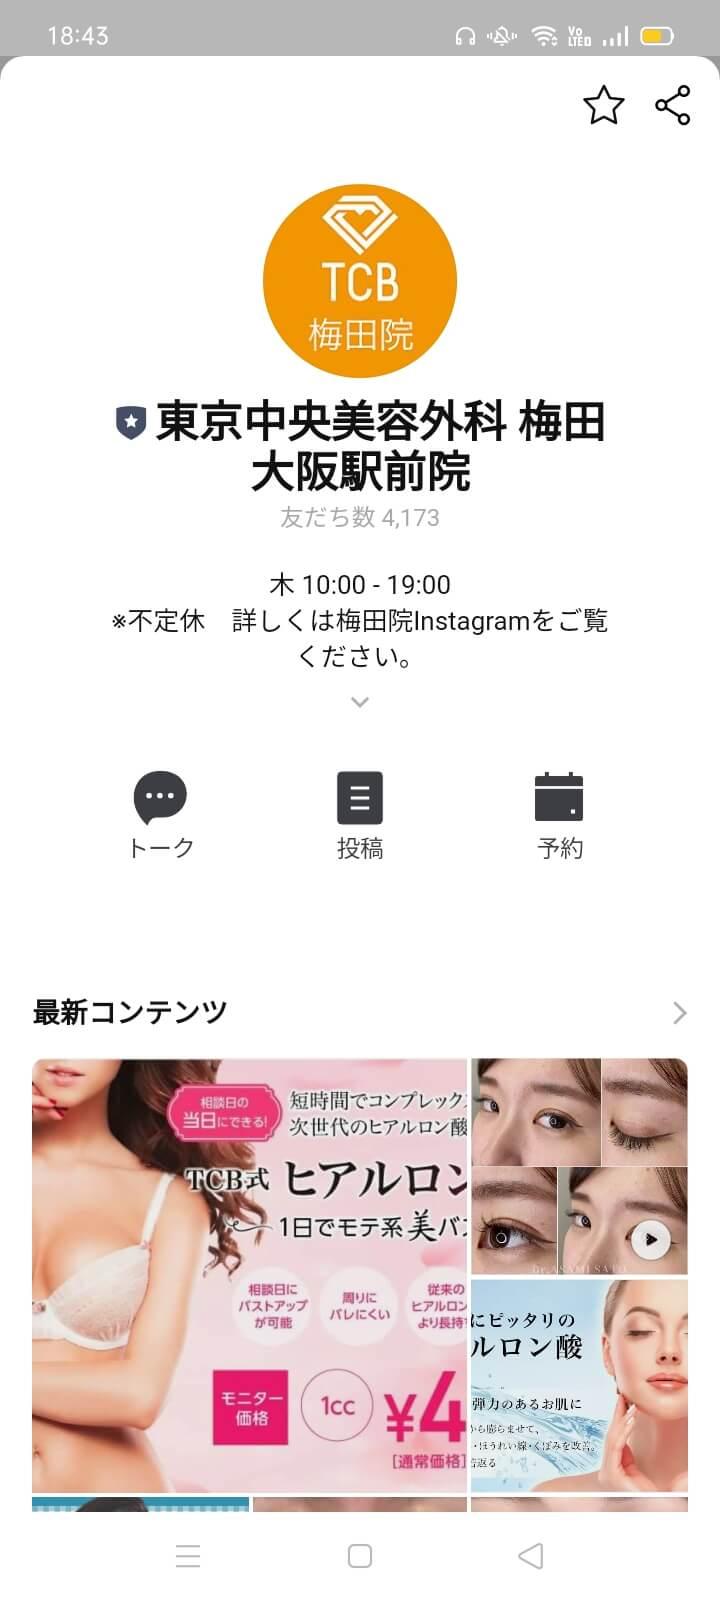 TCB東京中央美容外科のLINE公式アカウント